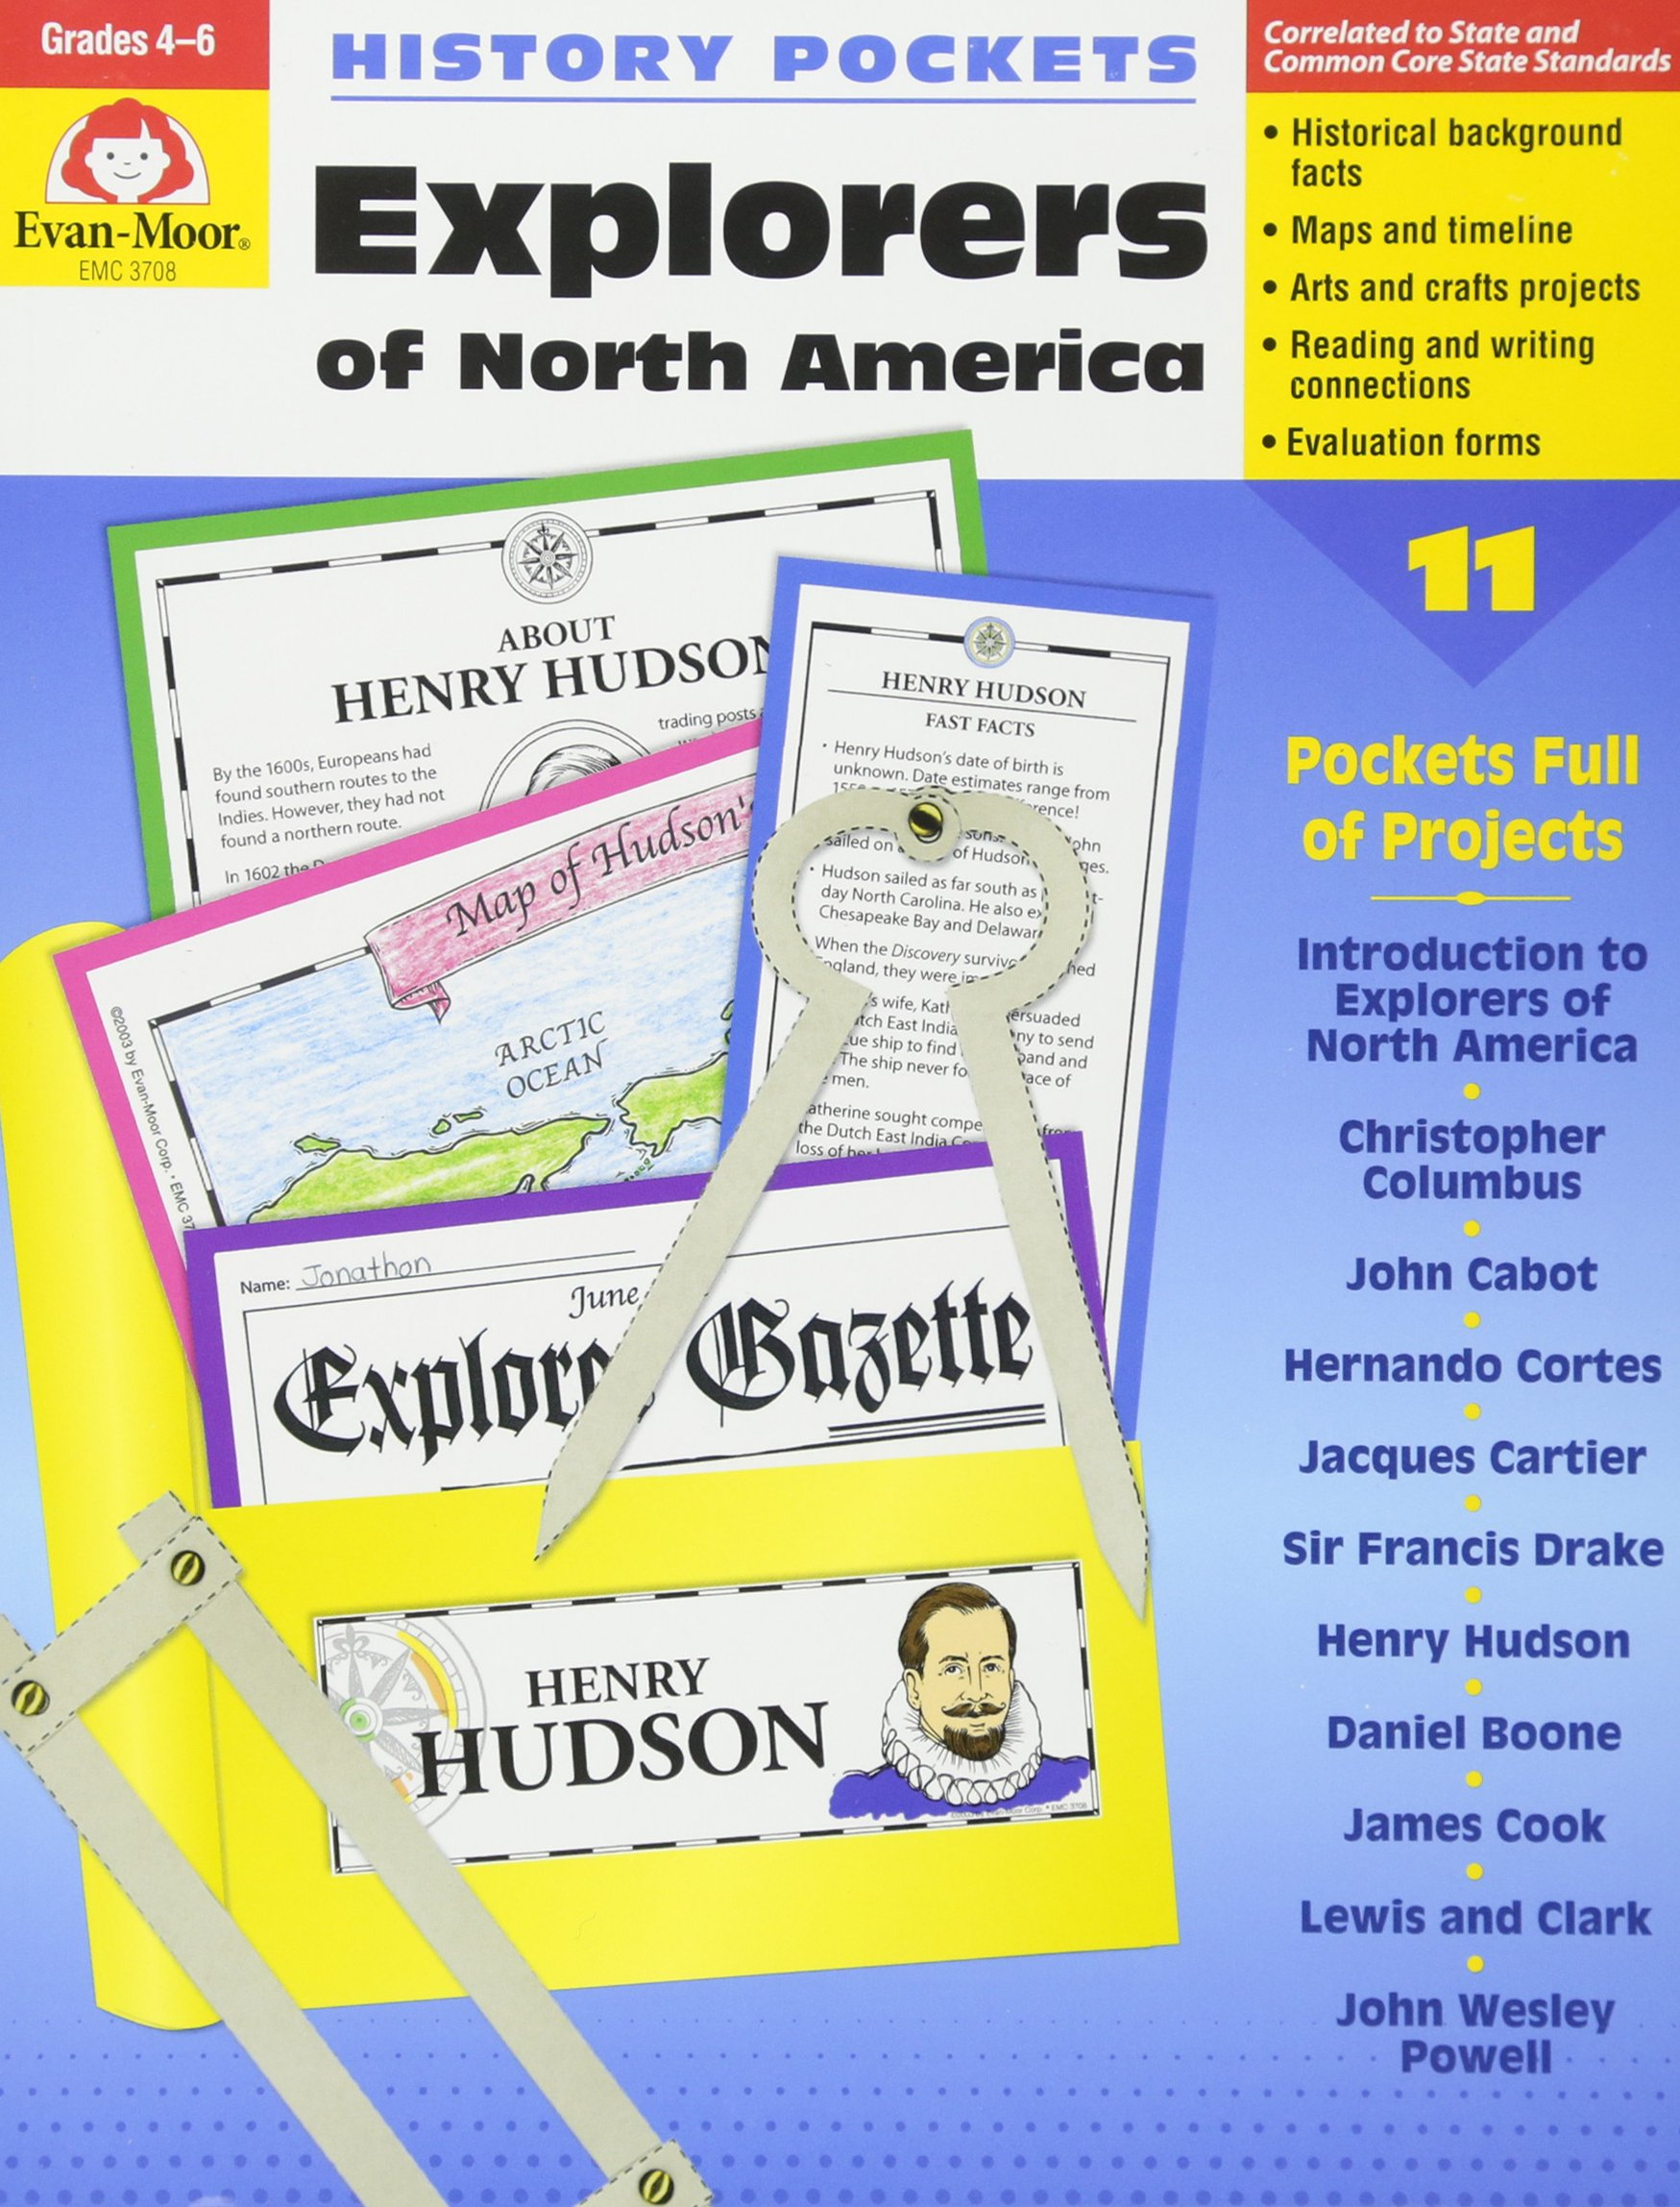 History Pockets: Explorers of North America, Grades 4-6+